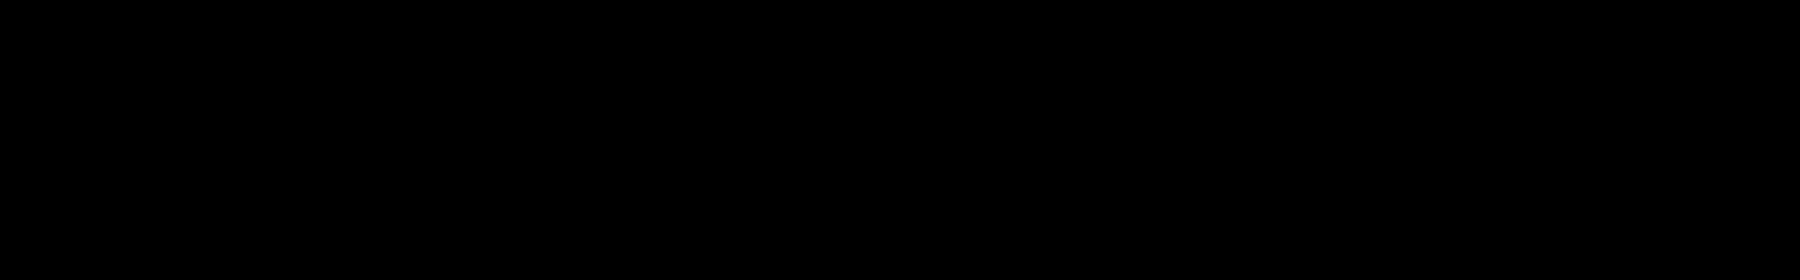 SINEE - SERUM TECHNO CONTROL audio waveform